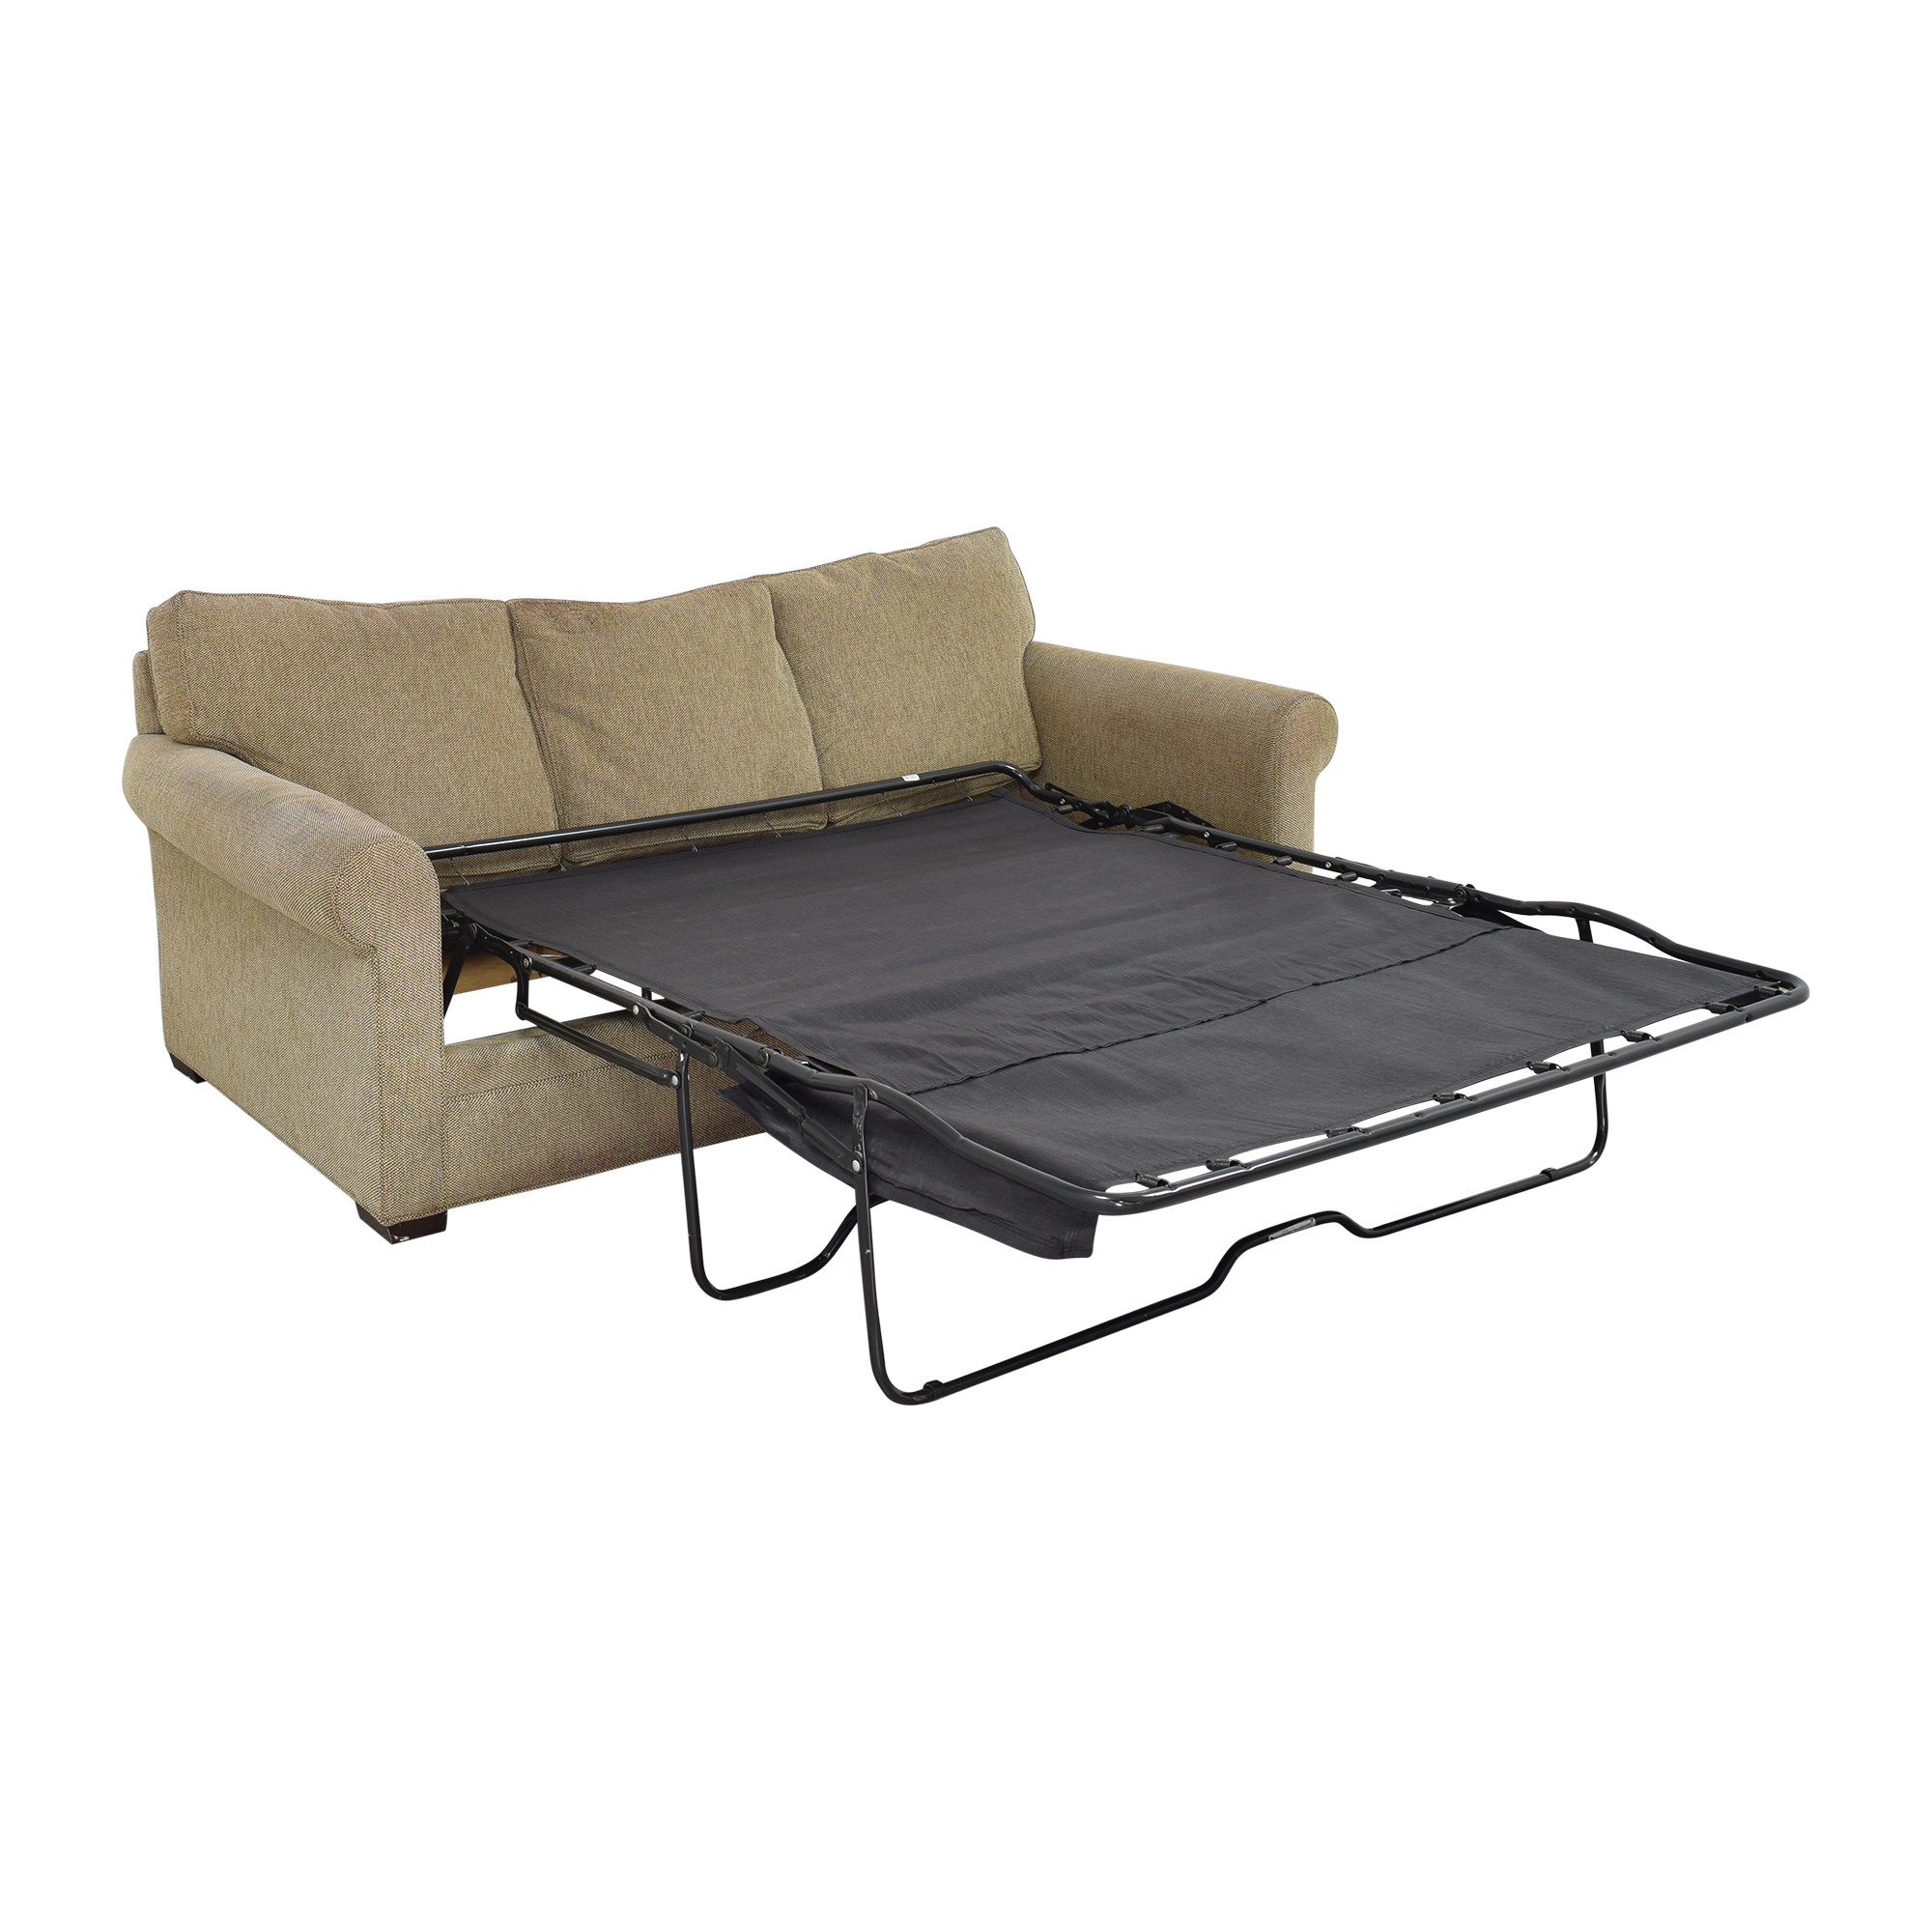 Crate & Barrel Three Cushion Sleeper Sofa sale